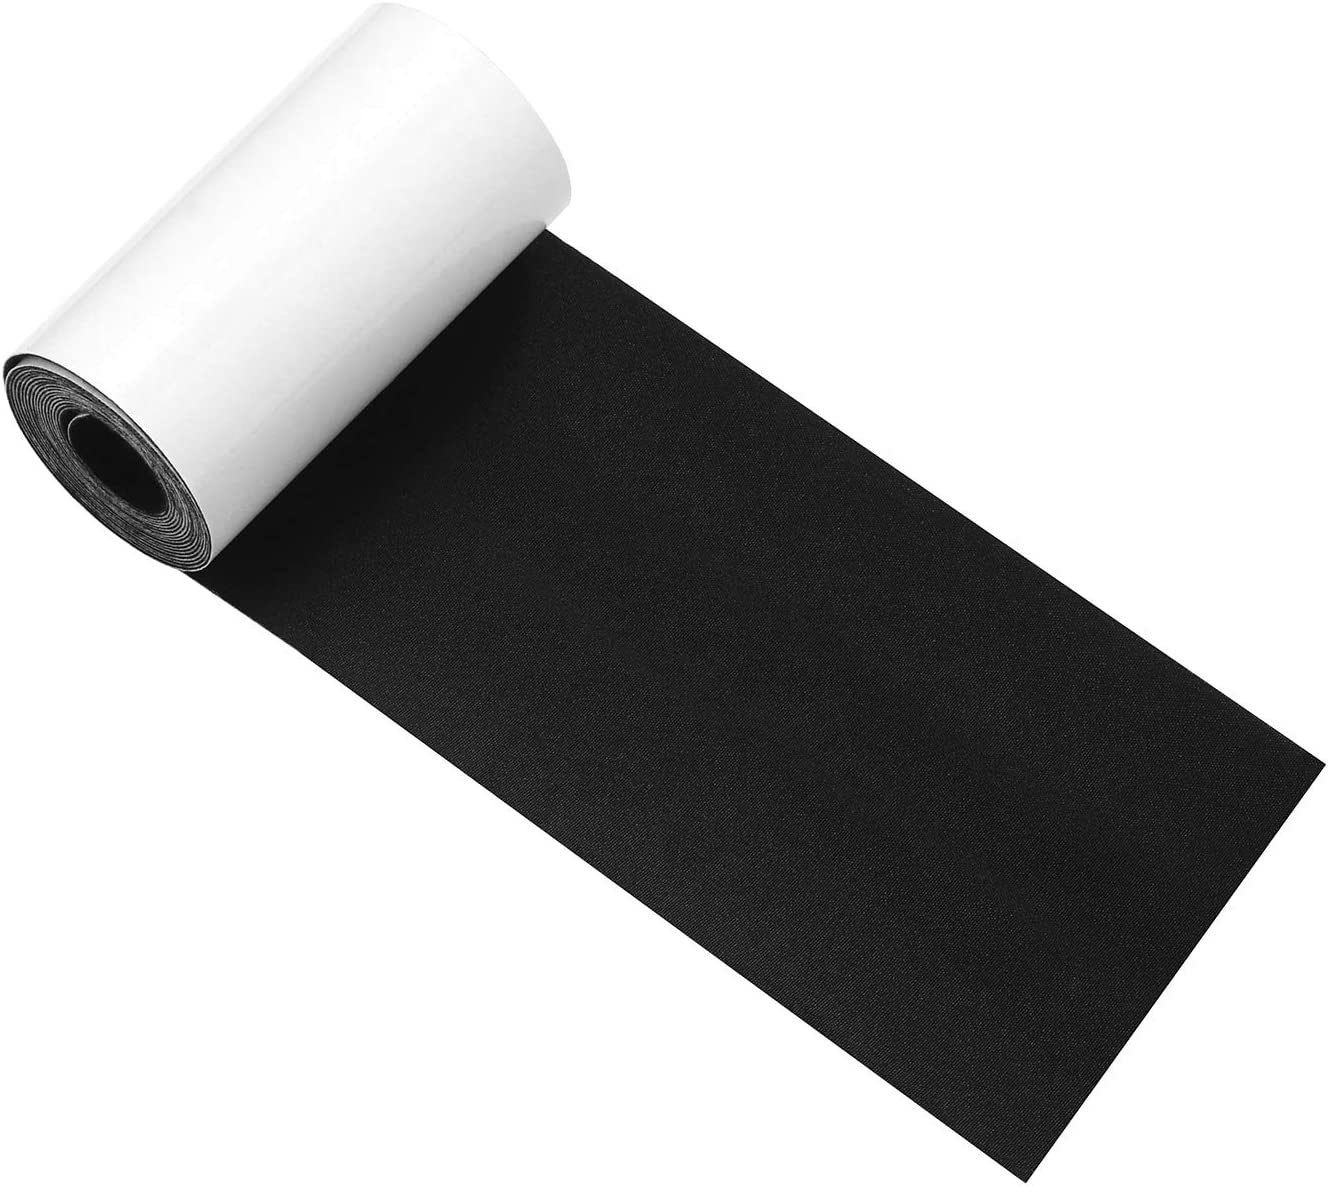 Sleeping Bag Tent Clothes Black, 3X60 Azobur Nylon Repair Patches 2.4X60 inch Nylon Self Adhesive Waterproof First Aid Repair Tenacious Lightweight Protable Fabric for Down Jacket